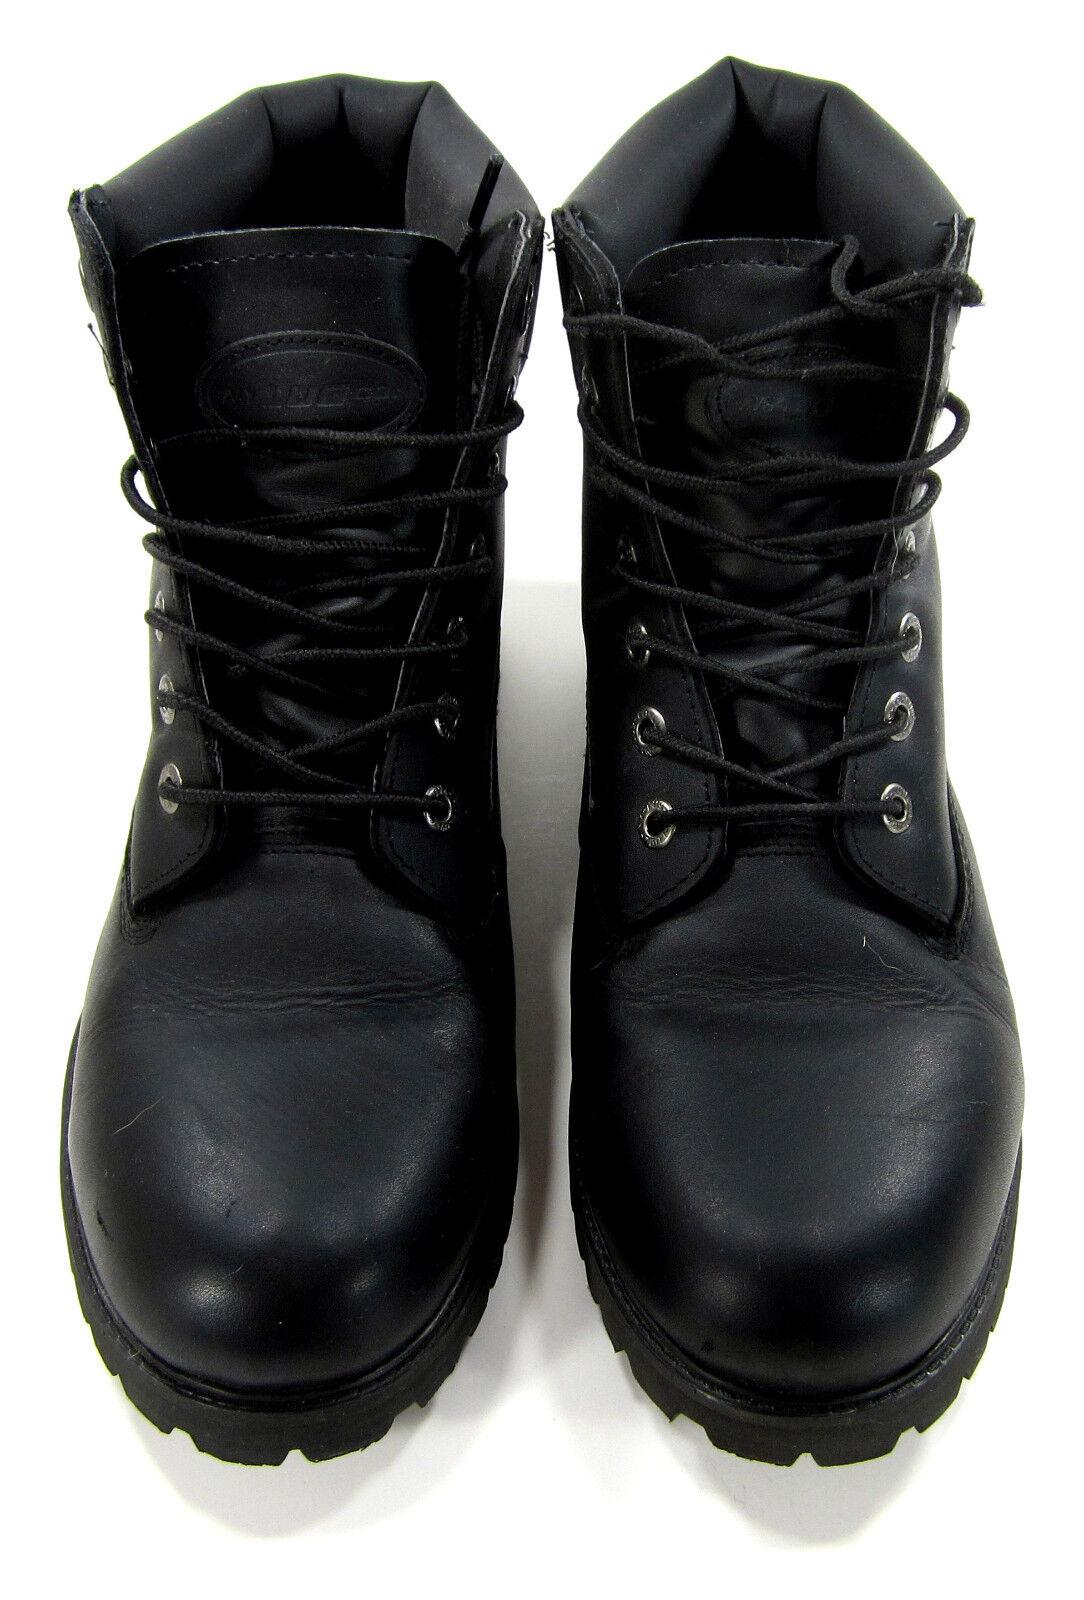 aa5b5bf6e2d Lugz Lugz Lugz Boots Drifter 6 Inch Leather Black Shoes Size 11 ...